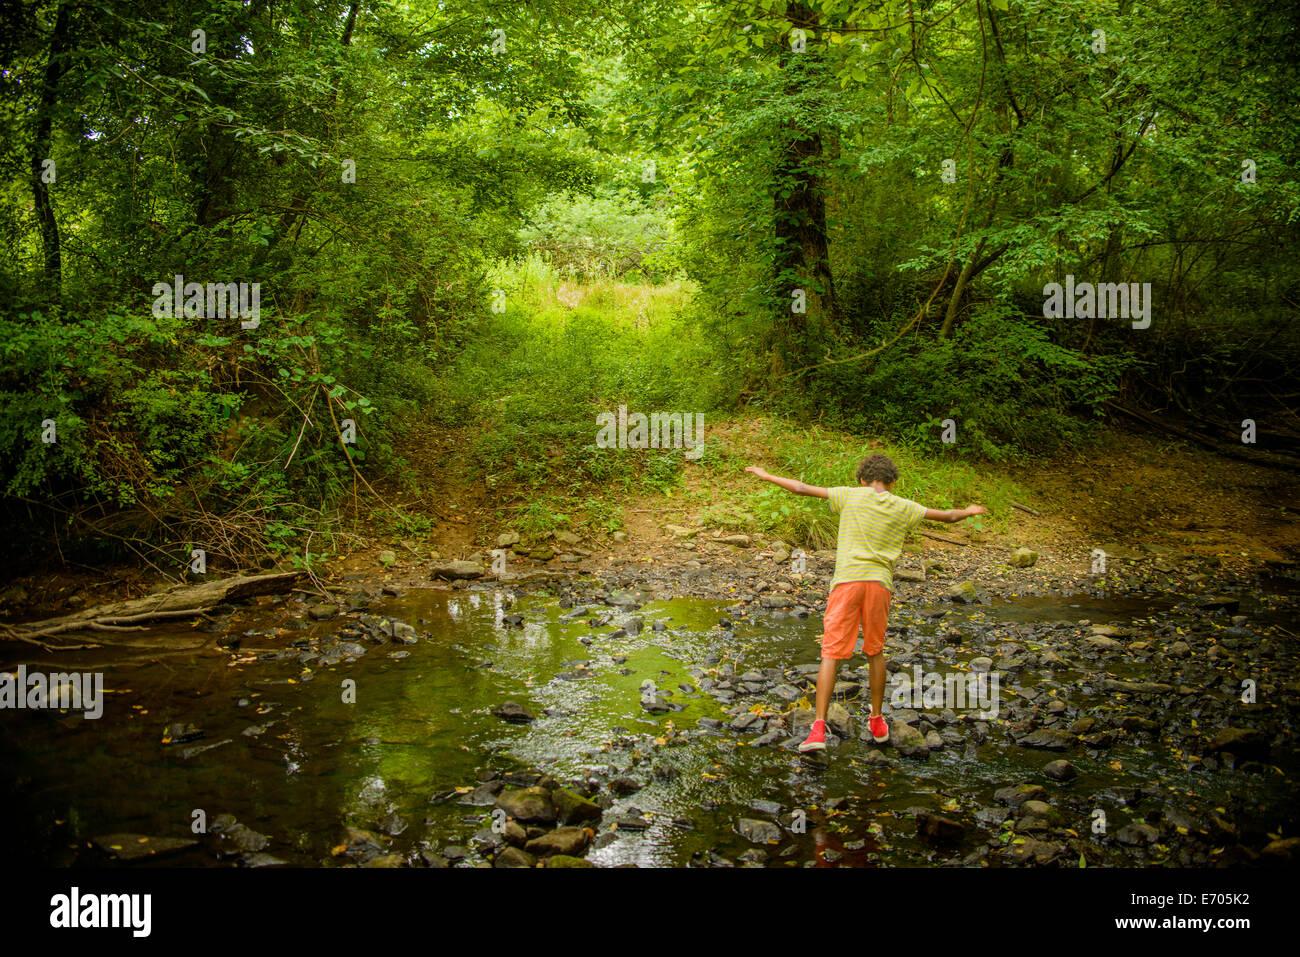 Boy at edge of stream - Stock Image